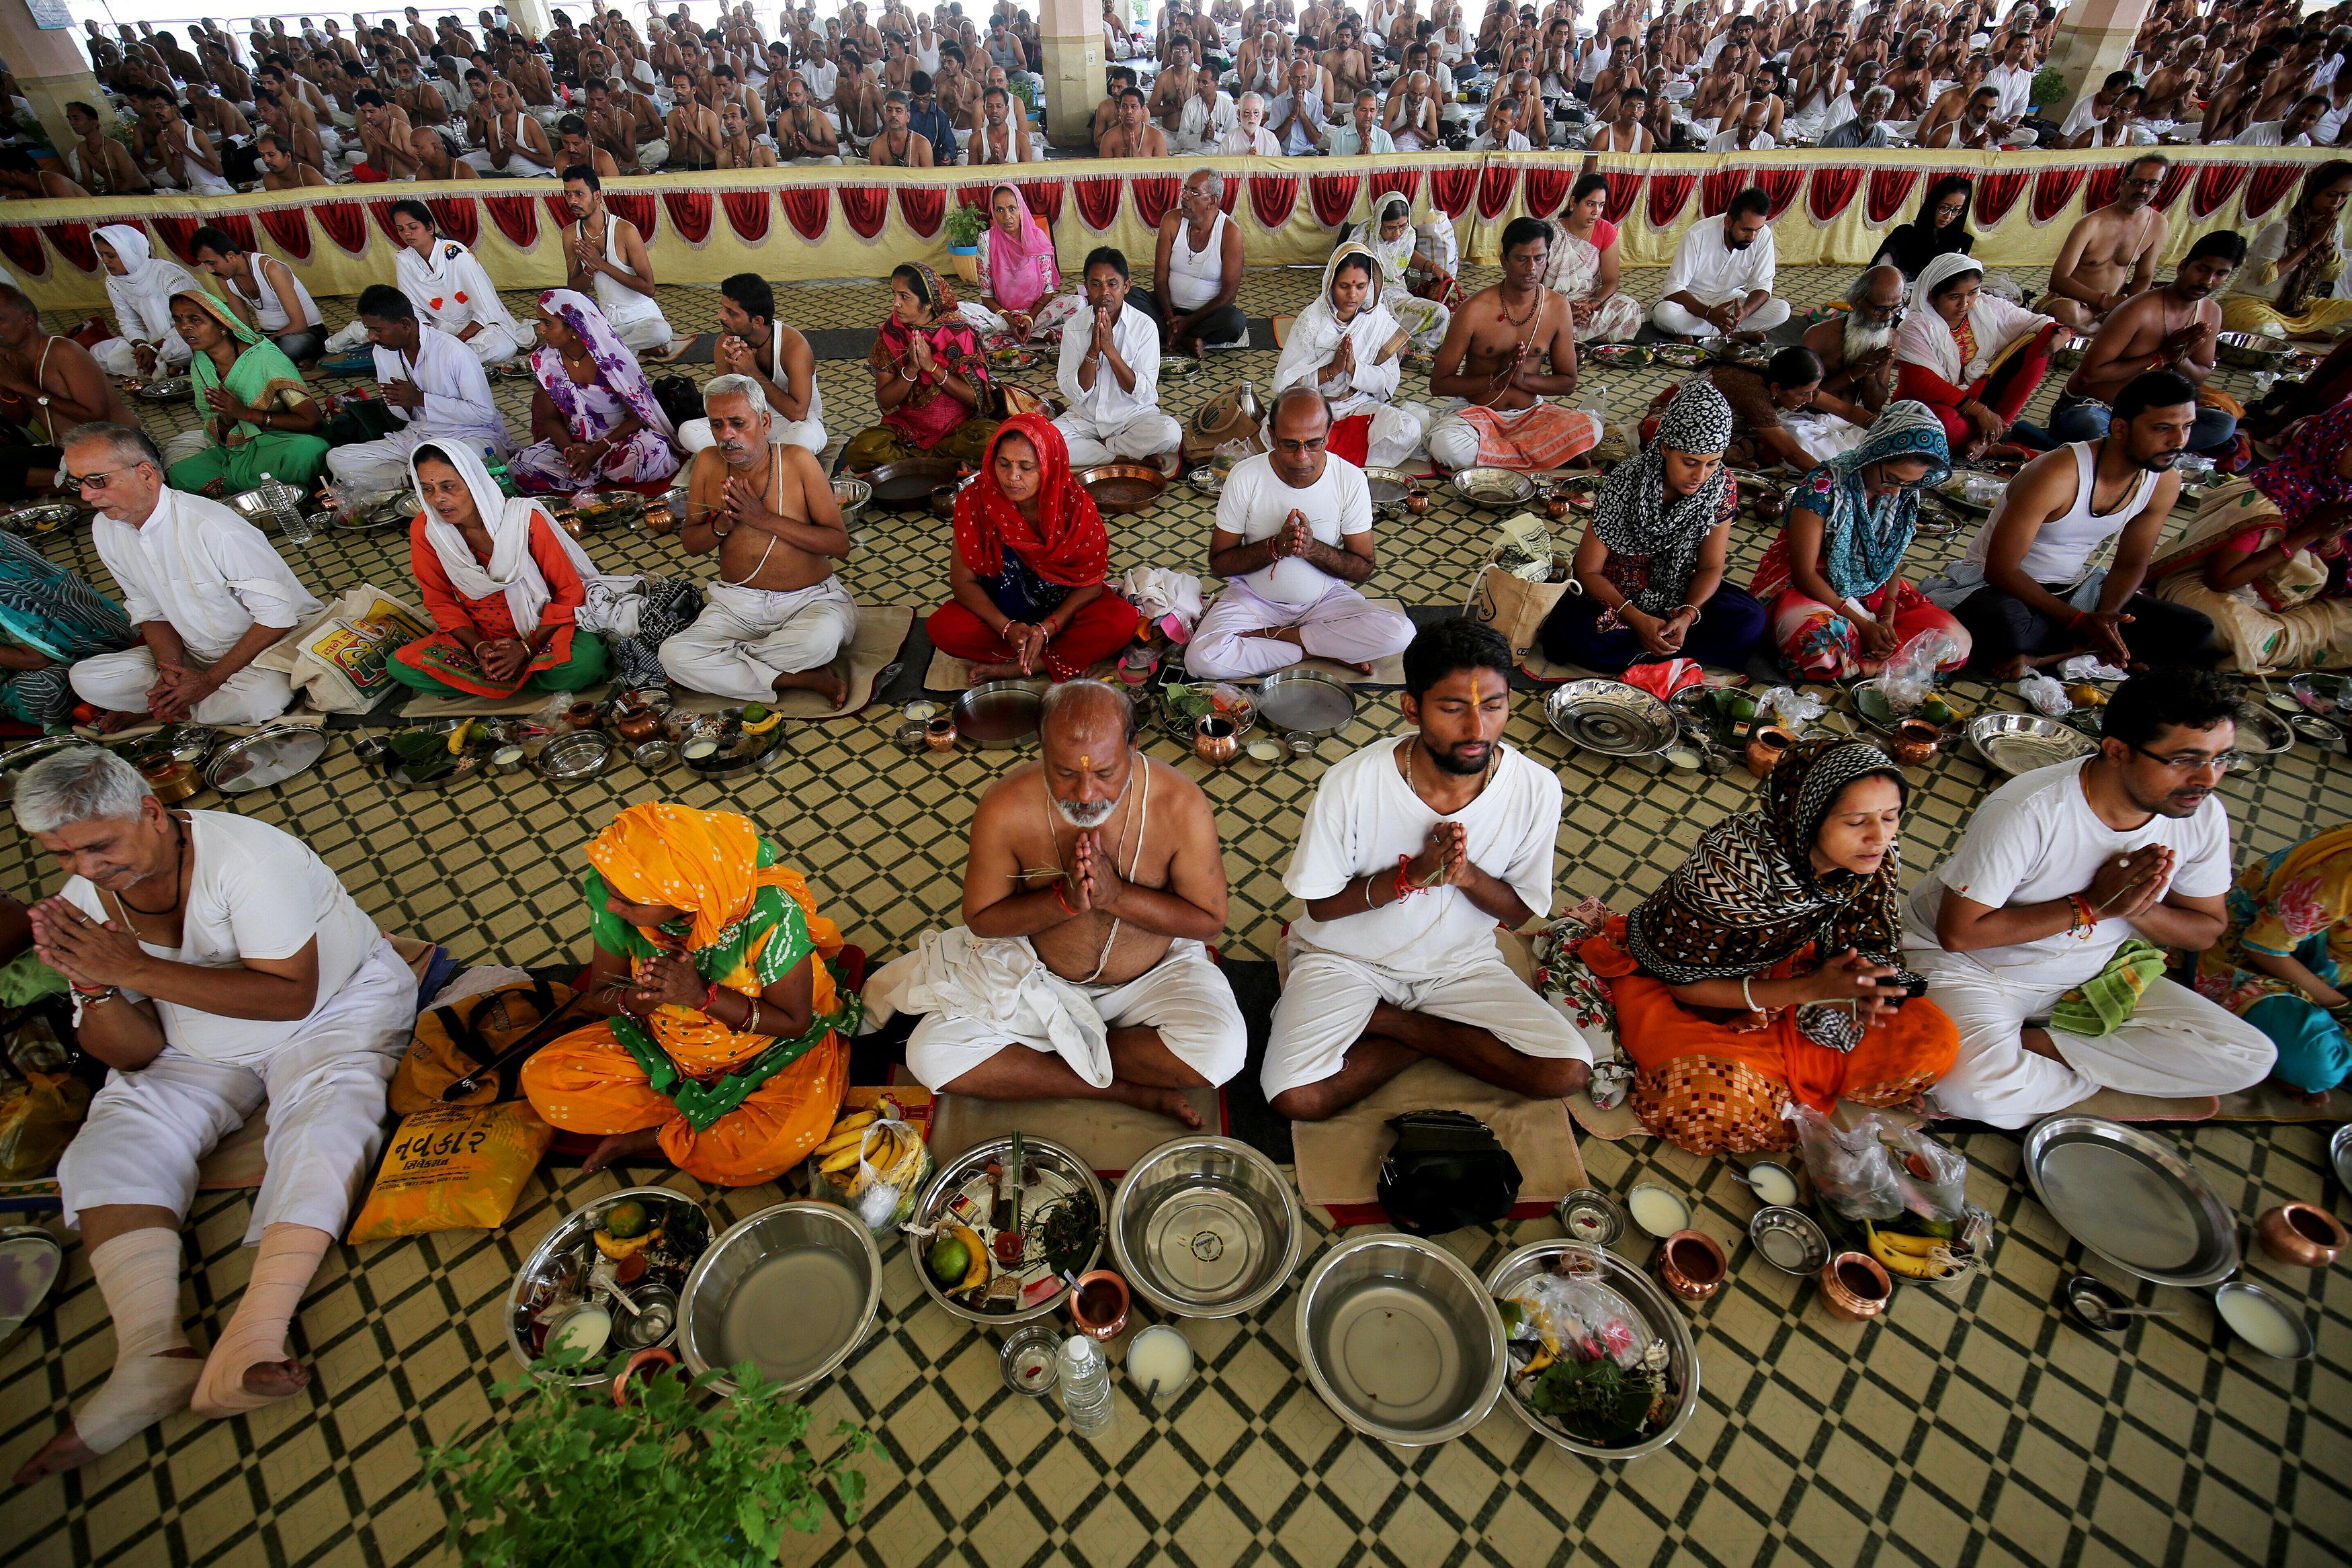 الهندوس يحيون ذكرى أسلافهم